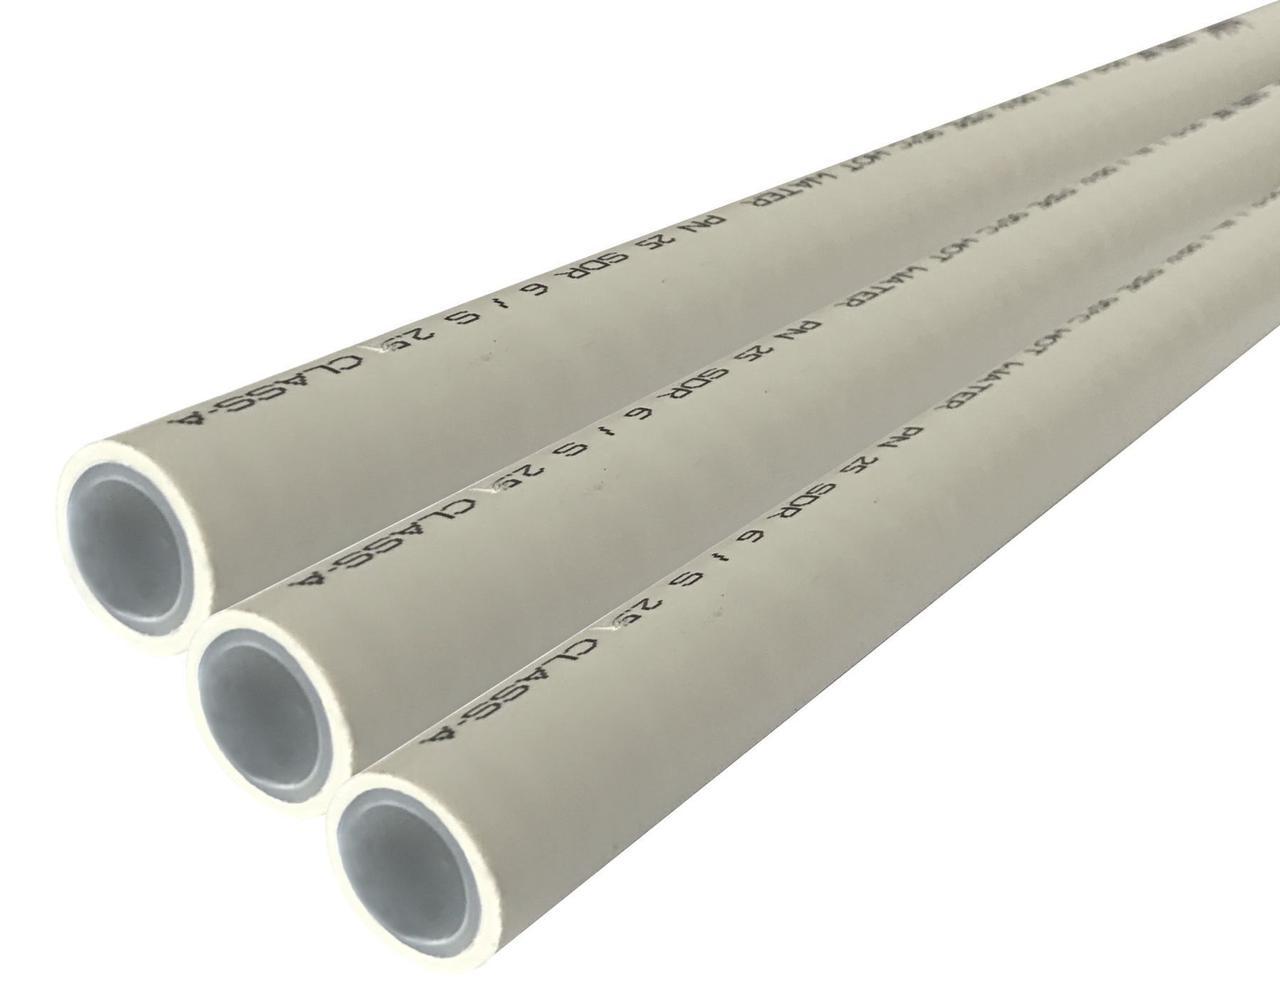 Труба поліпропіленова з алюмінієвою фольгою Kalde Super Pipe PPR 25 мм PN 25